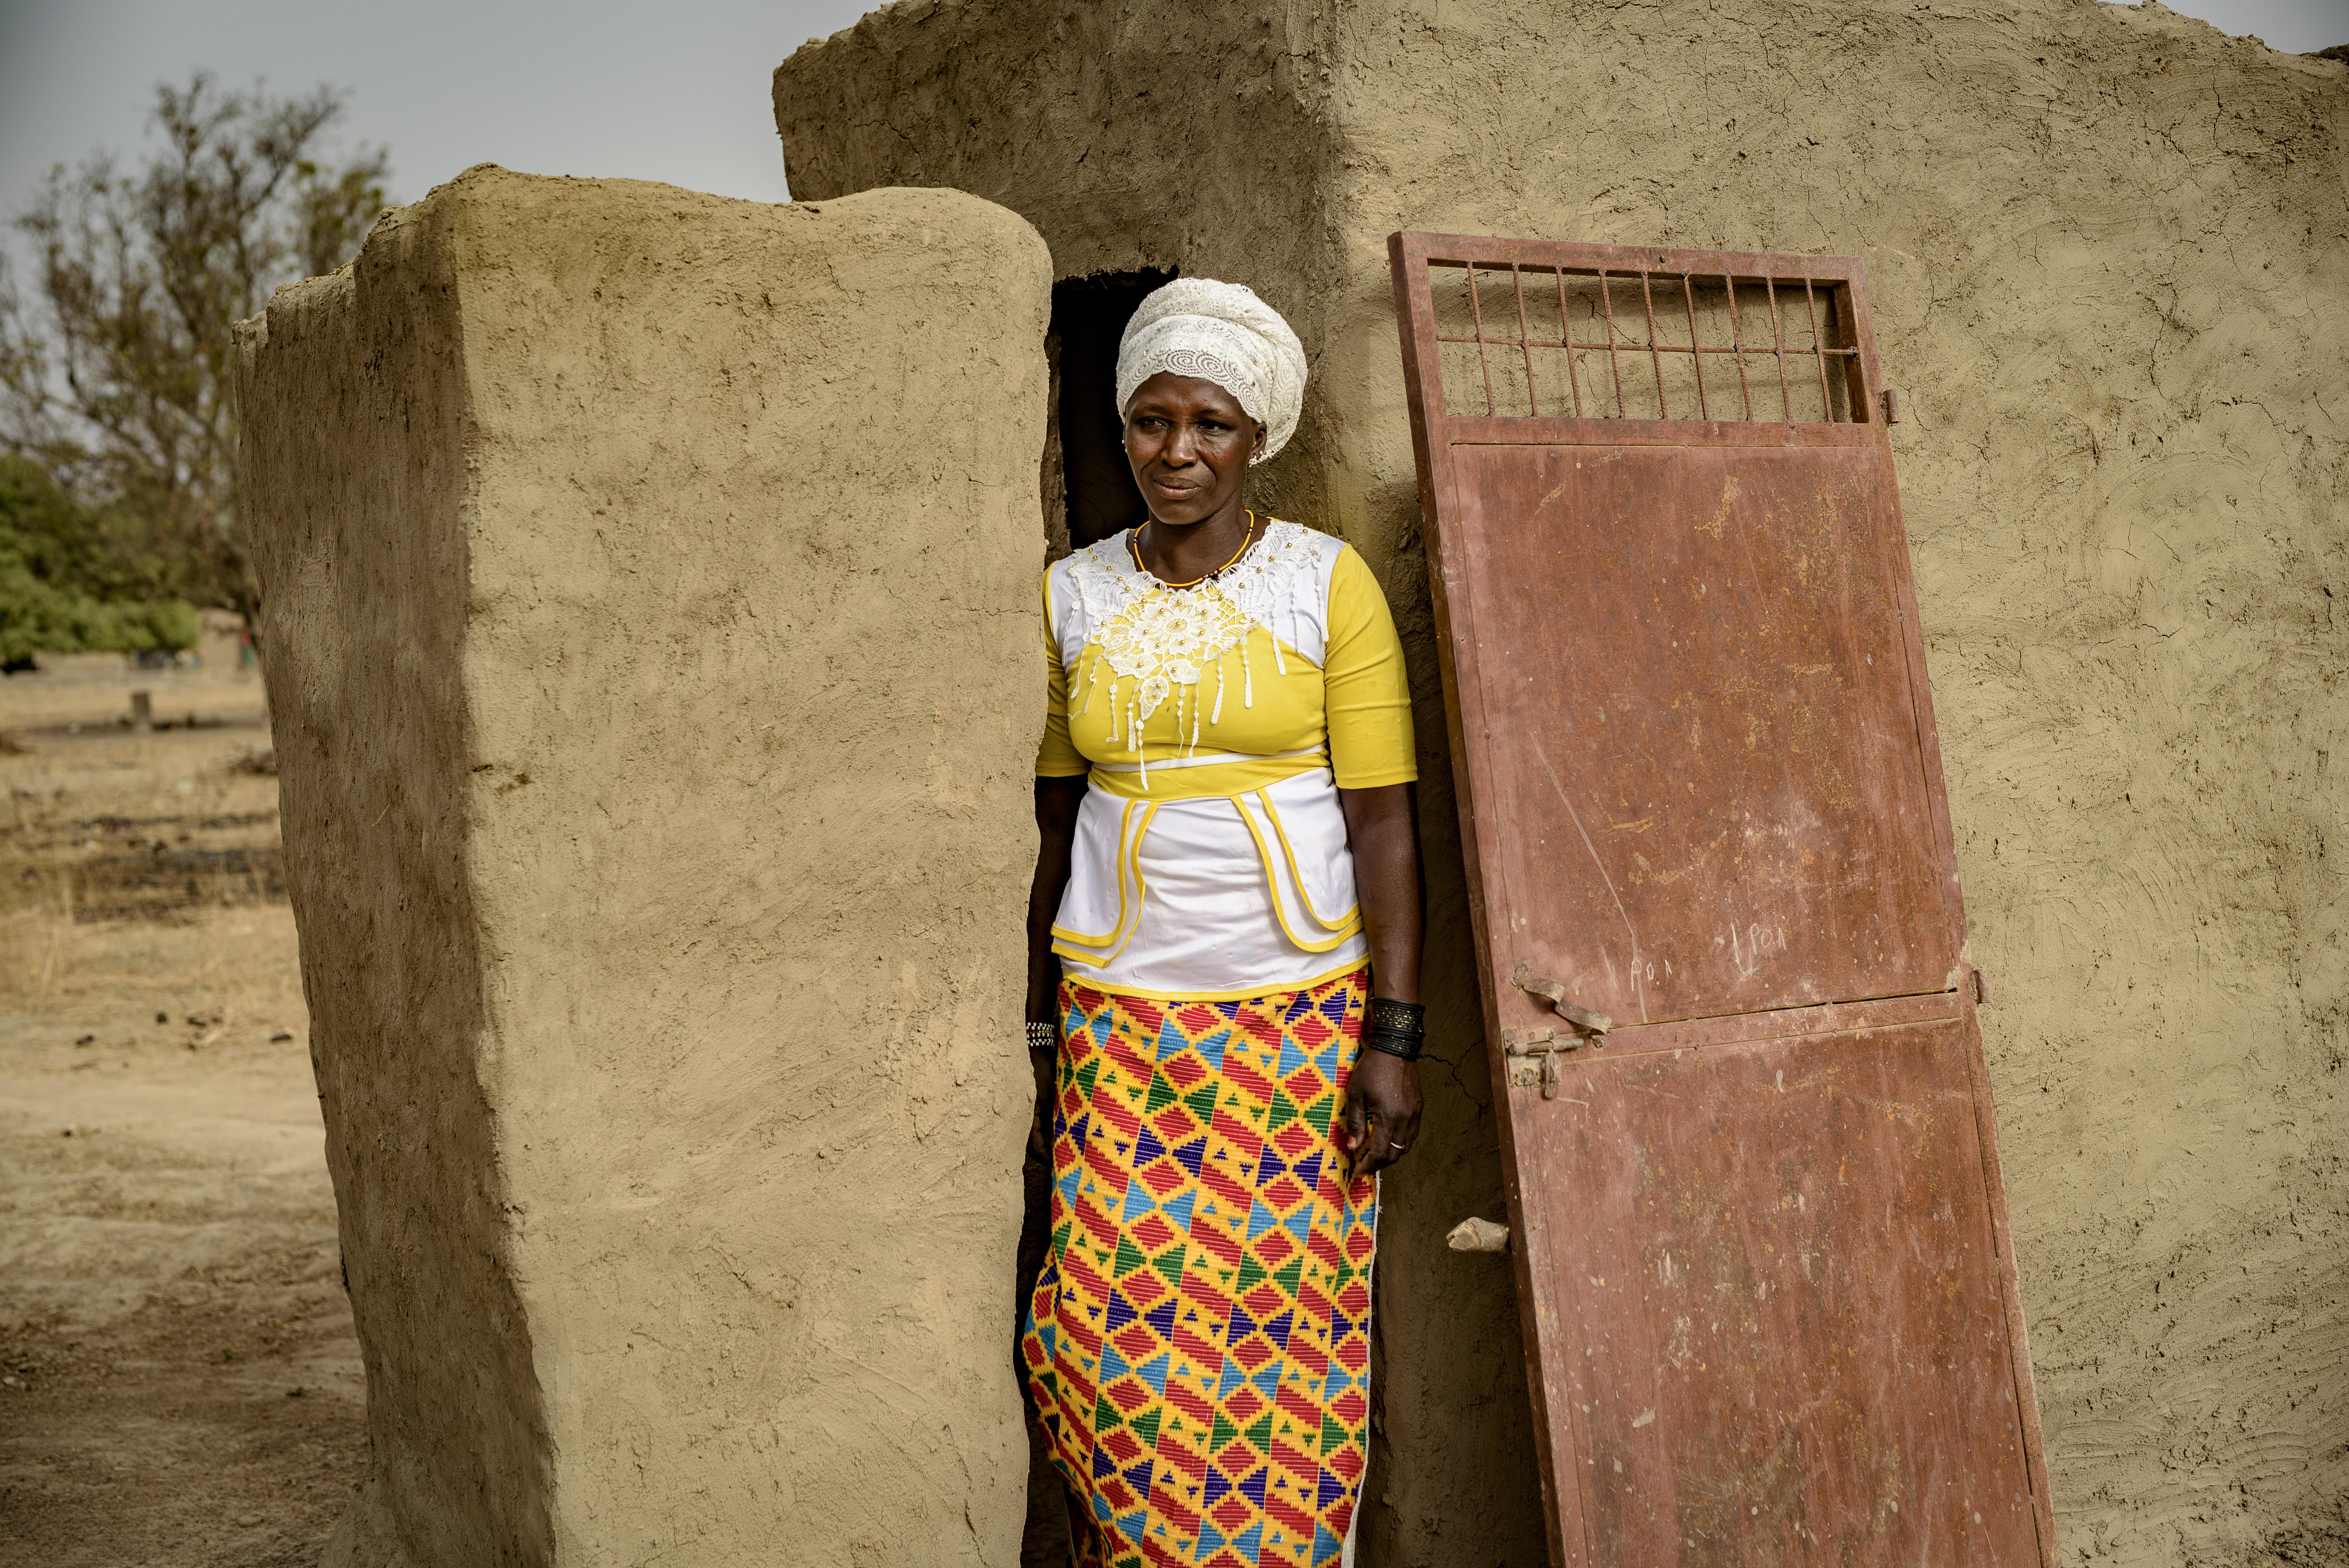 Burkina Fasocproject unicef letrines